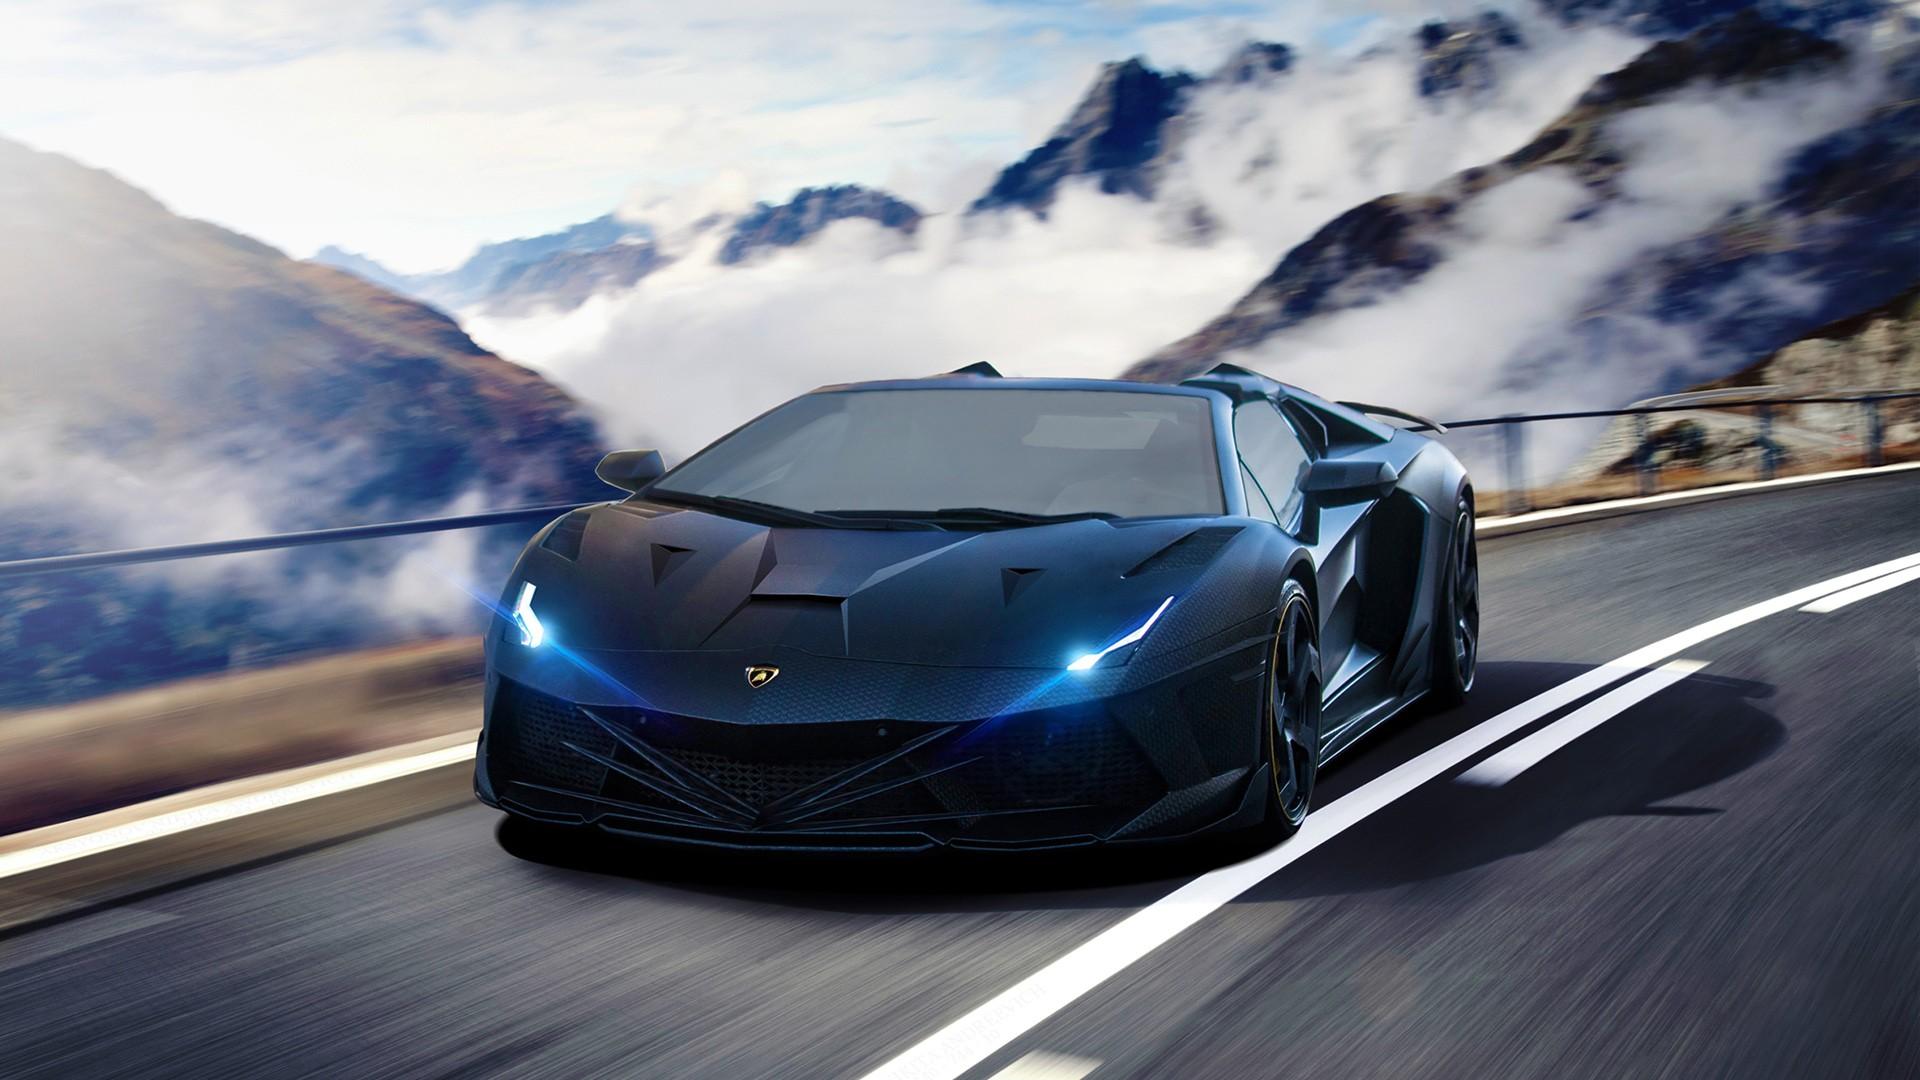 Lamborghini Aventador Supercar Wallpaper Hd Car